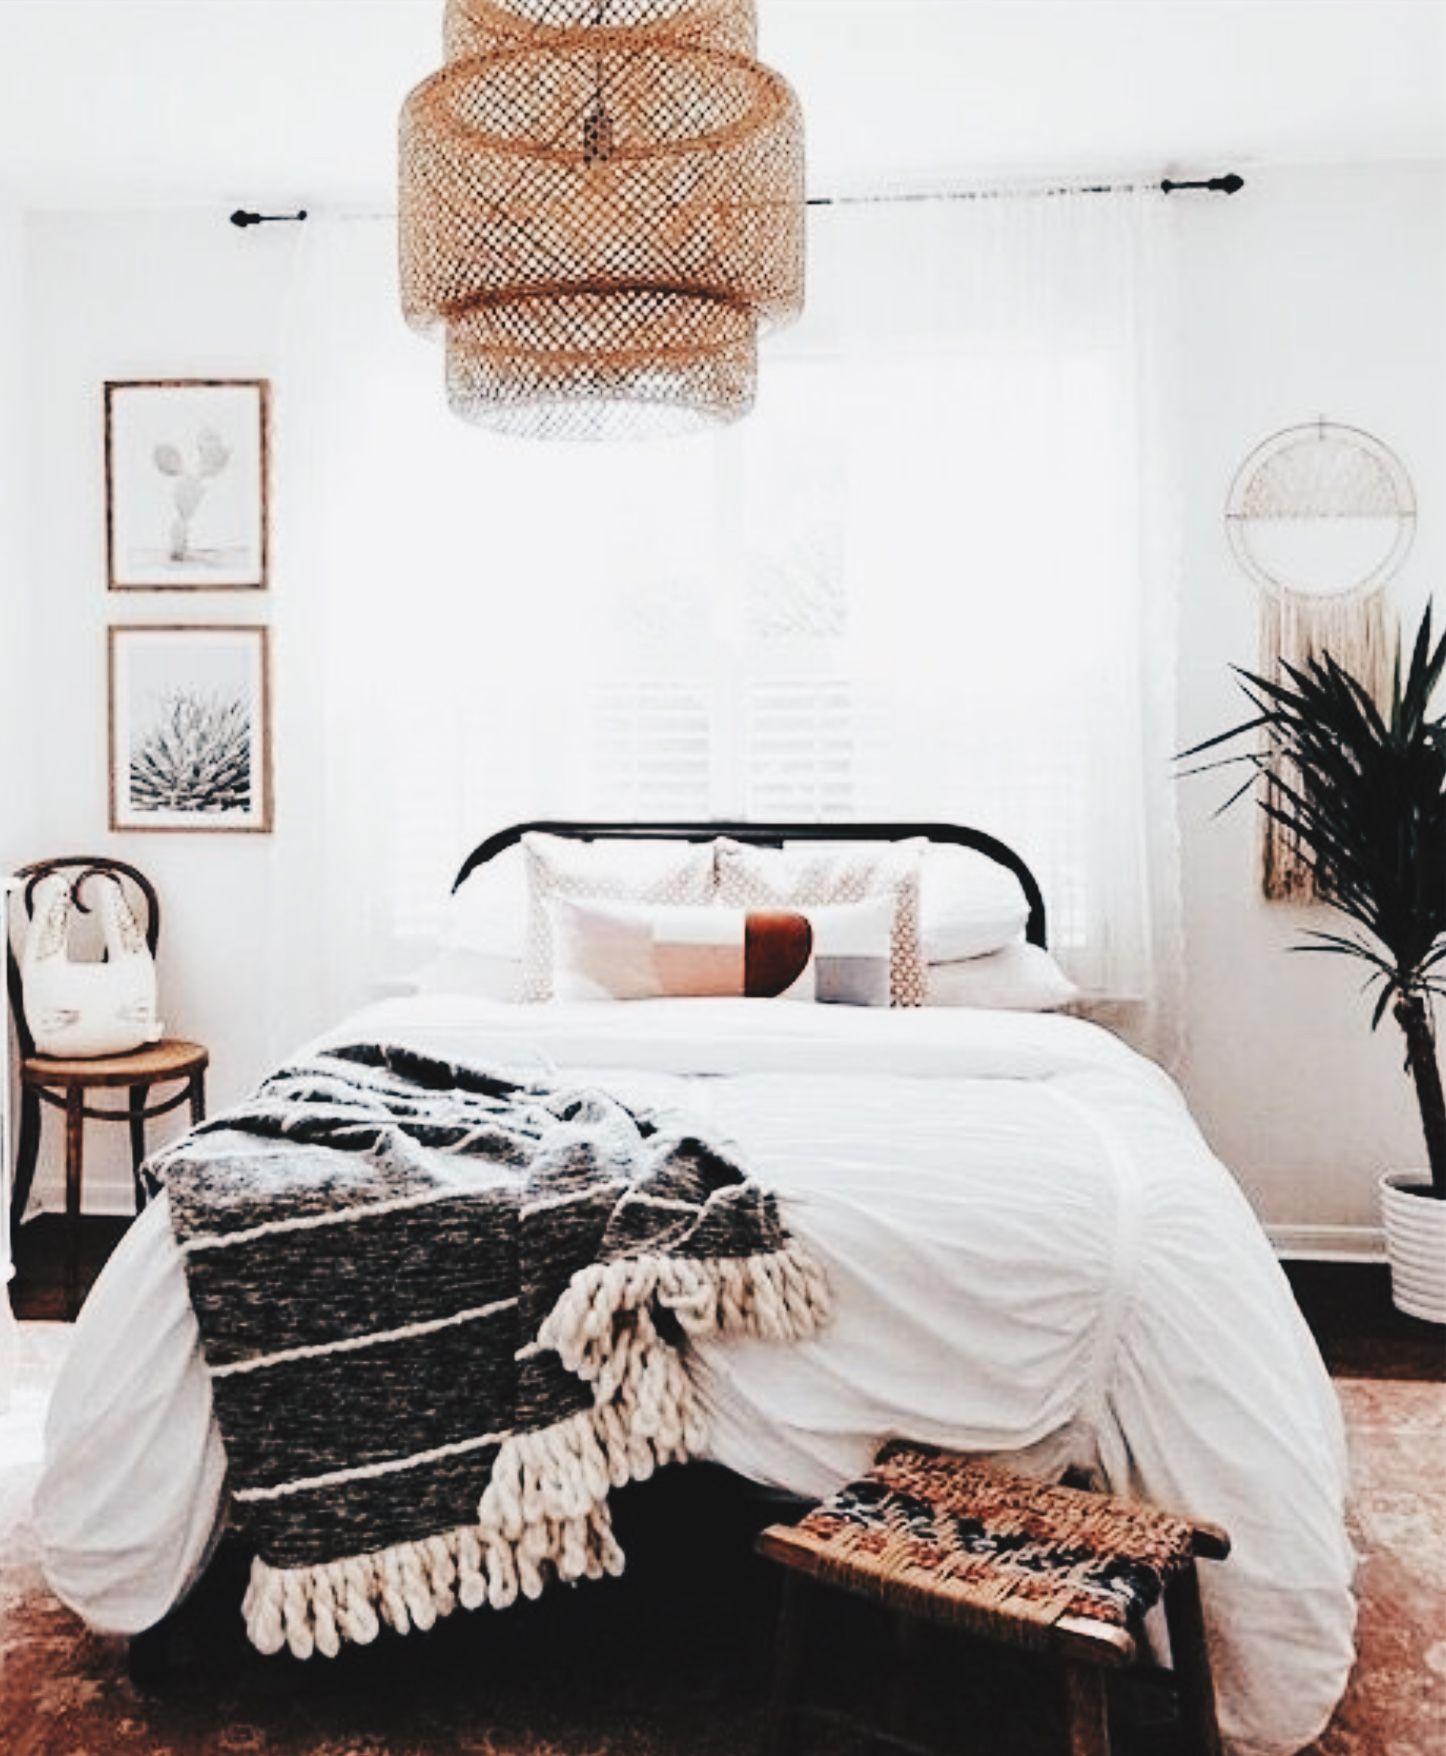 Bedroom home decor   Bed   Linens   Lighting   Modern ...